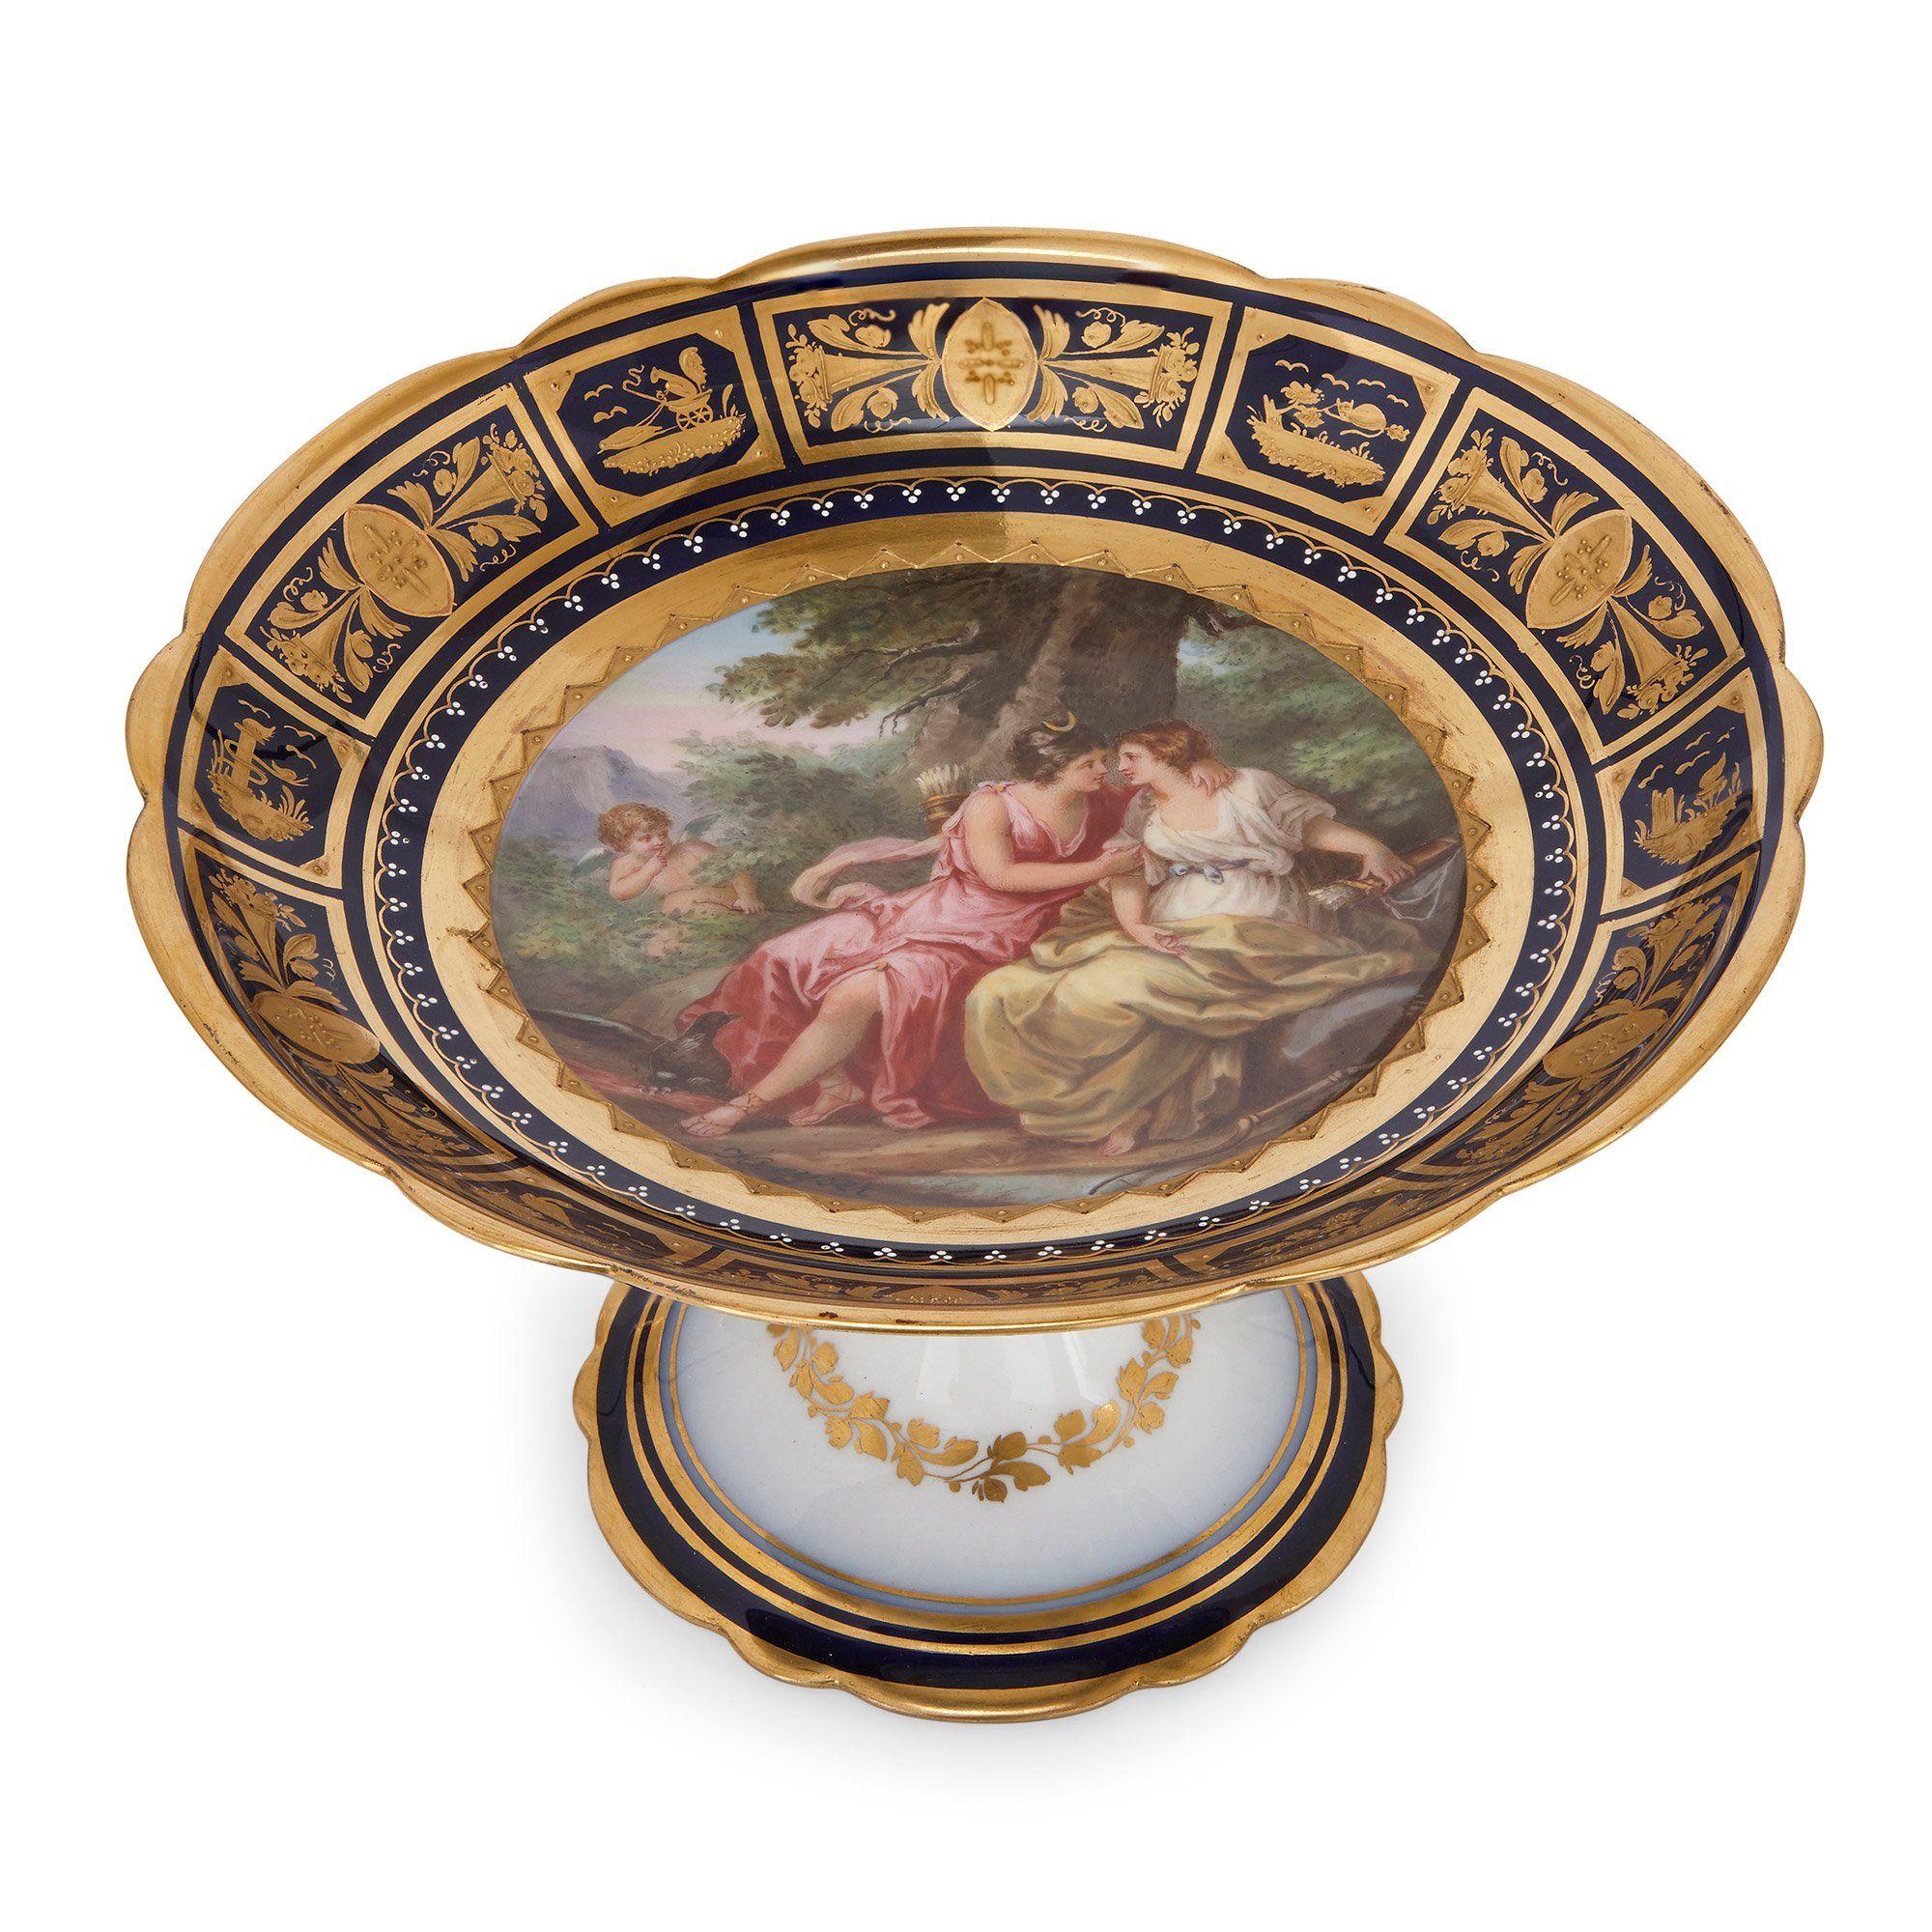 Royal Vienna Porcelain Antique Dessert Service Mayfair